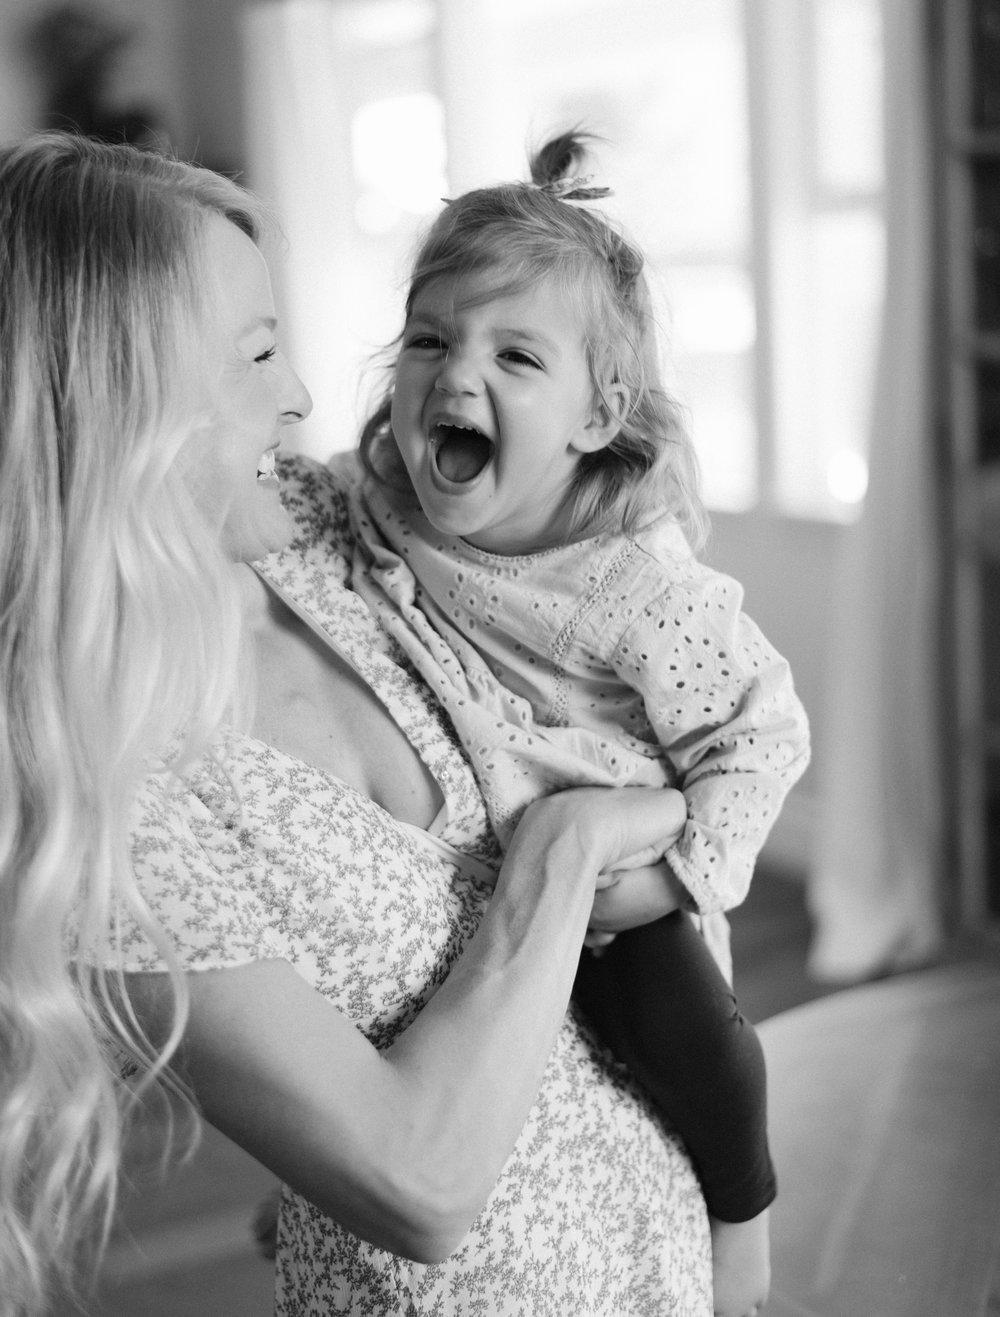 motherhood, captured-10.jpg